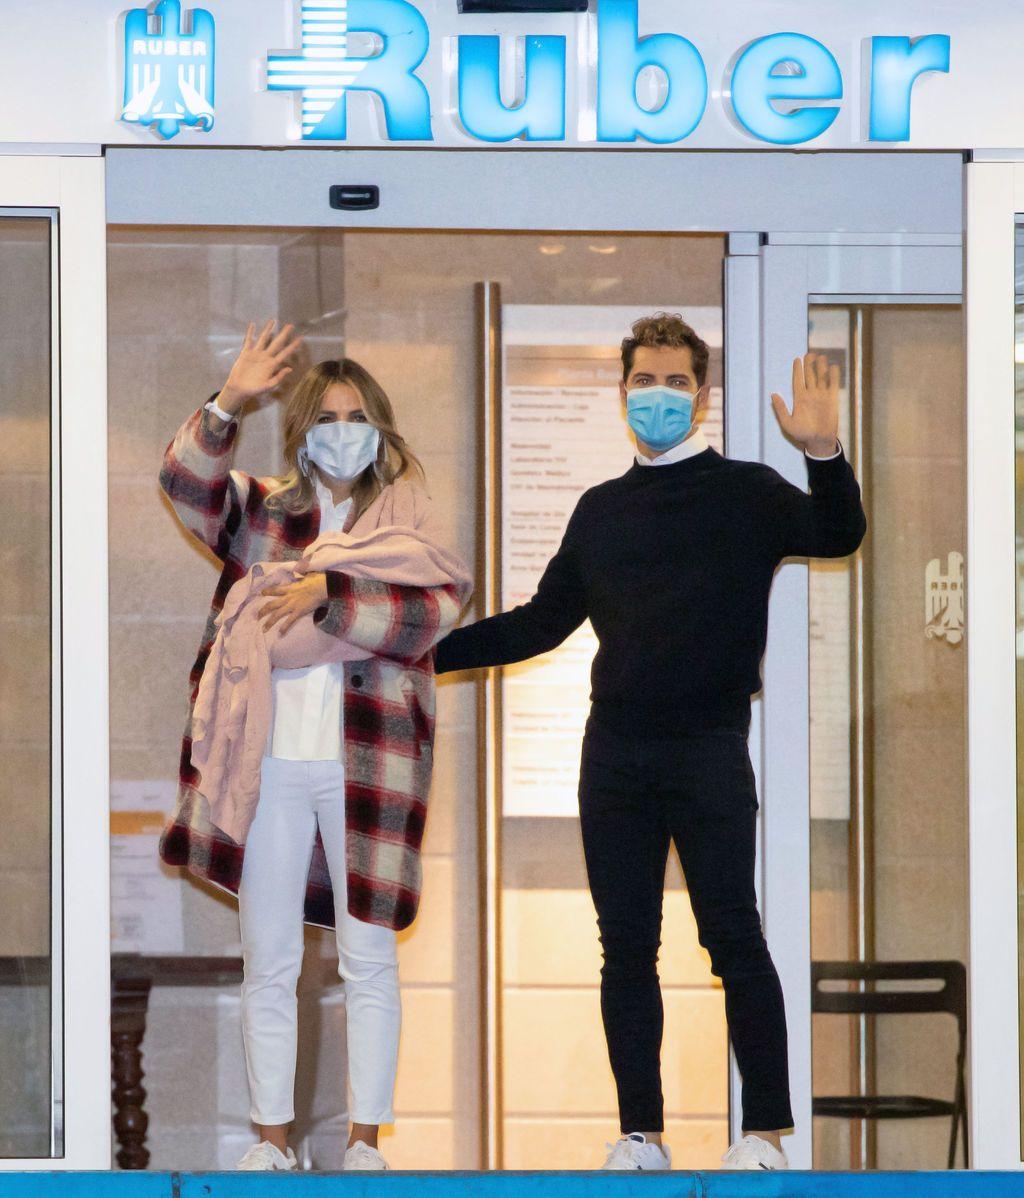 David Bisbal y Rosanna Zanetti salen del hospital con su hija Bianca